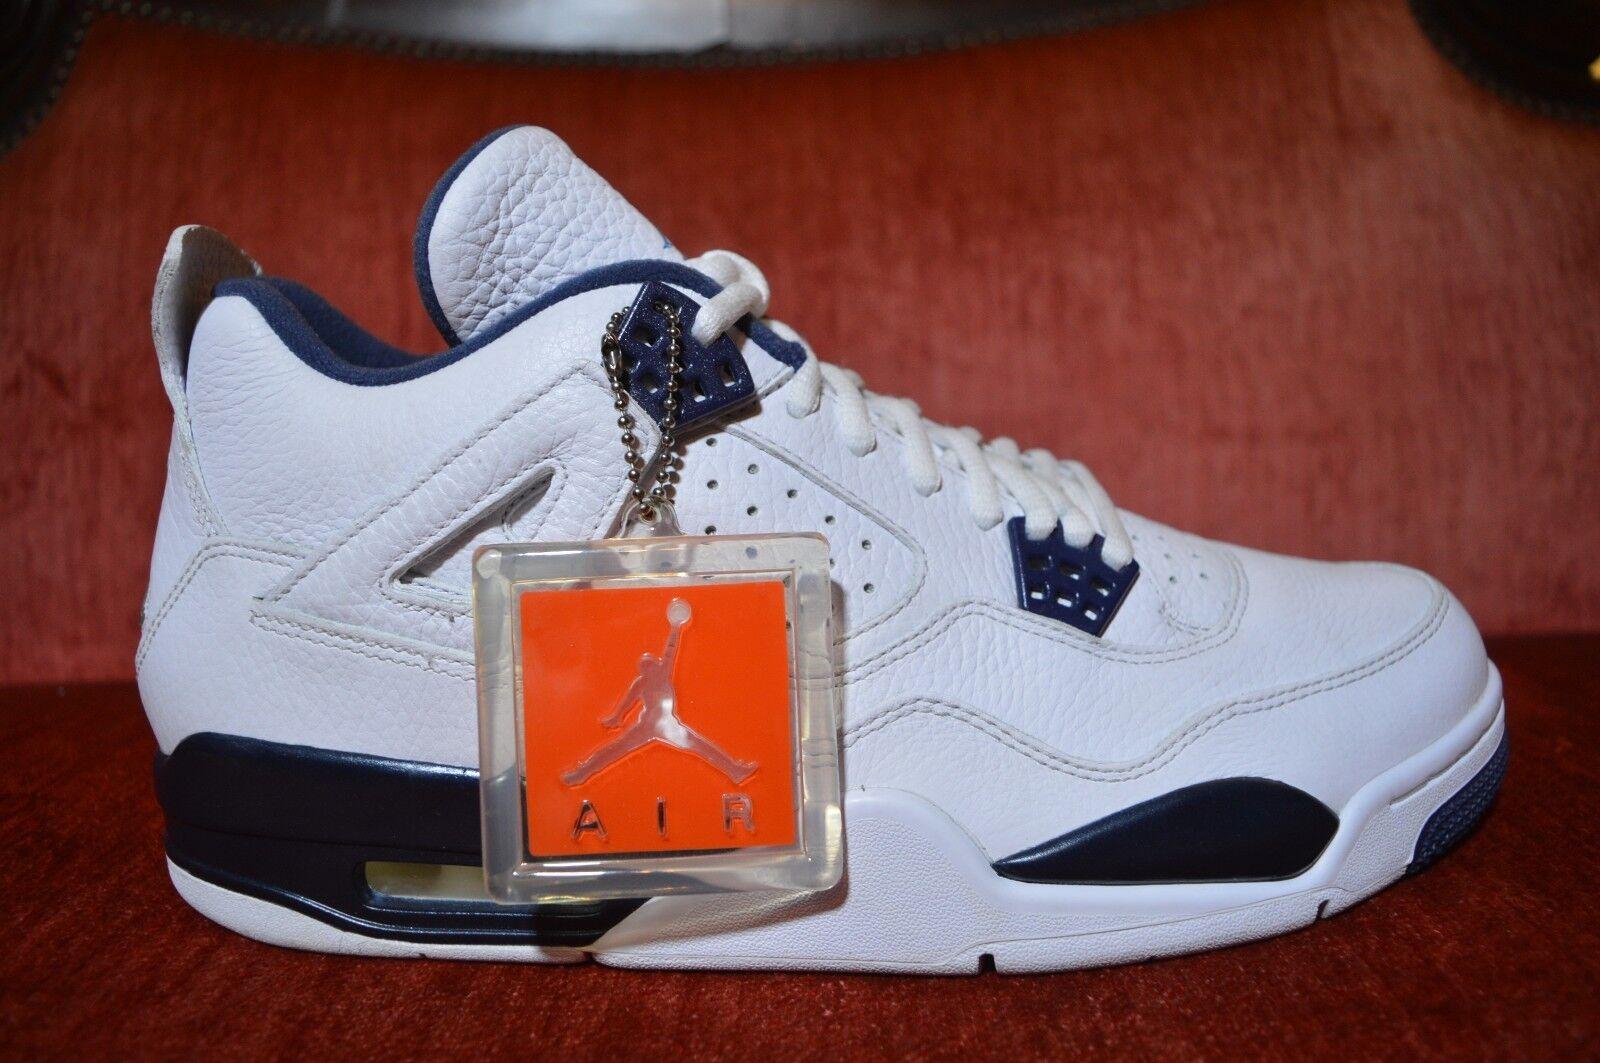 low priced 603e9 da9e6 Nike Air Jordan 4 Retro LS Legend bluee Mens Size Size Size 11 314254 107  NEW